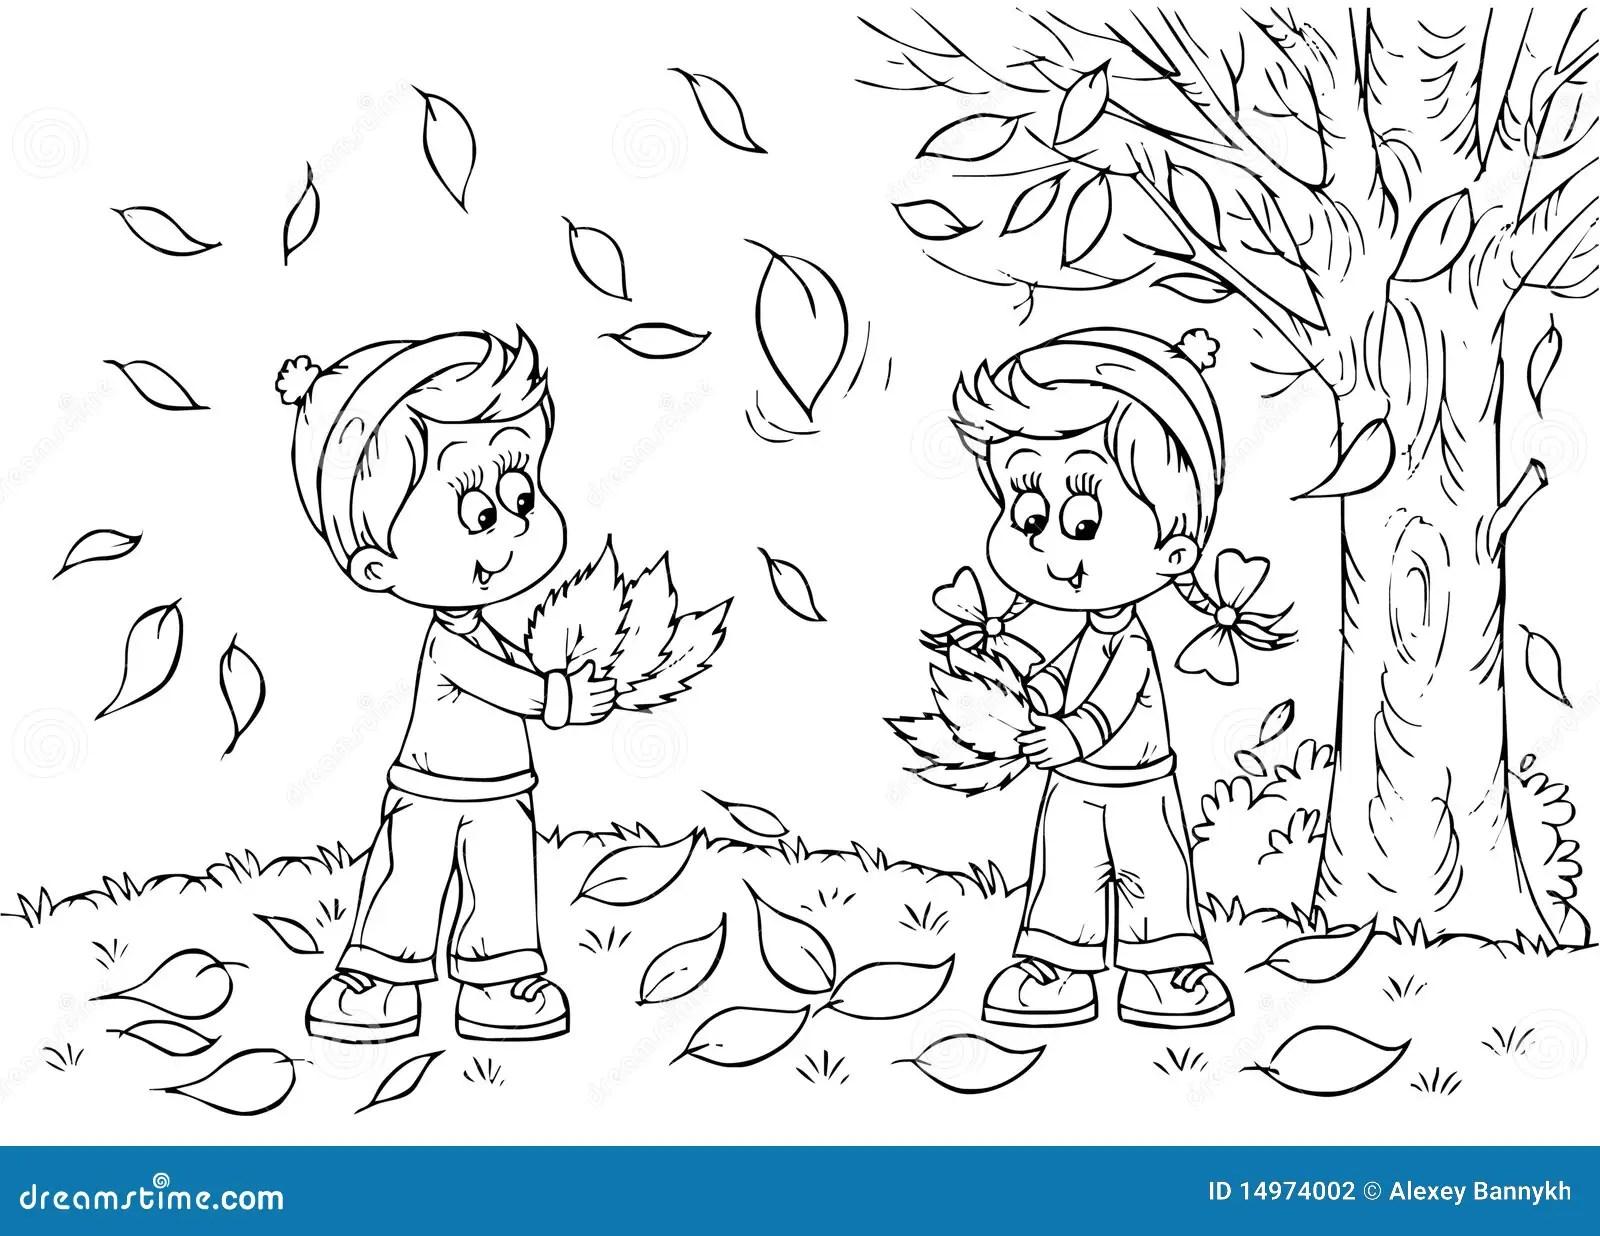 Children in autumn stock illustration. Image of book